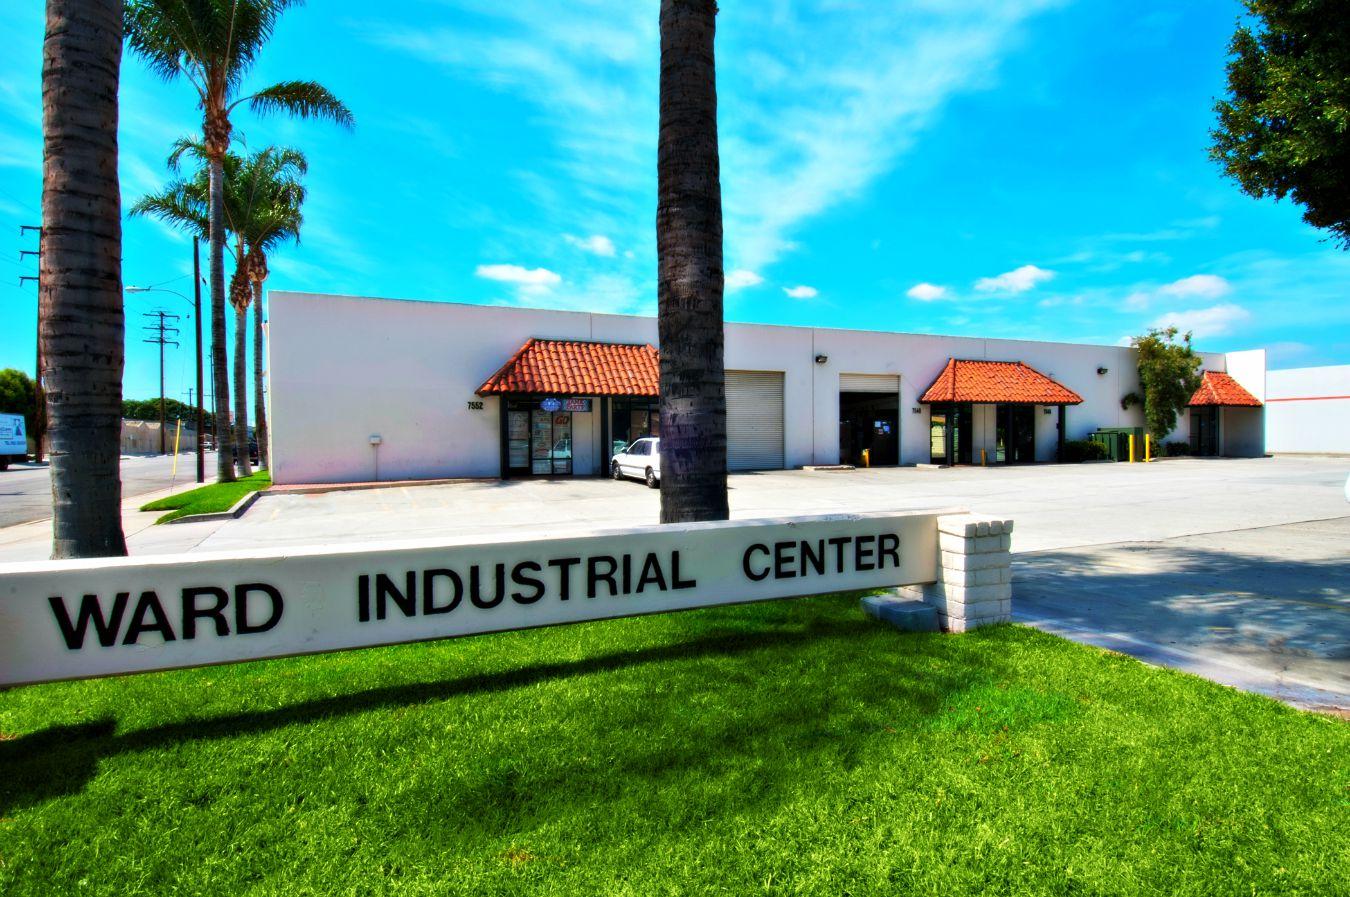 Ward Industrial Center